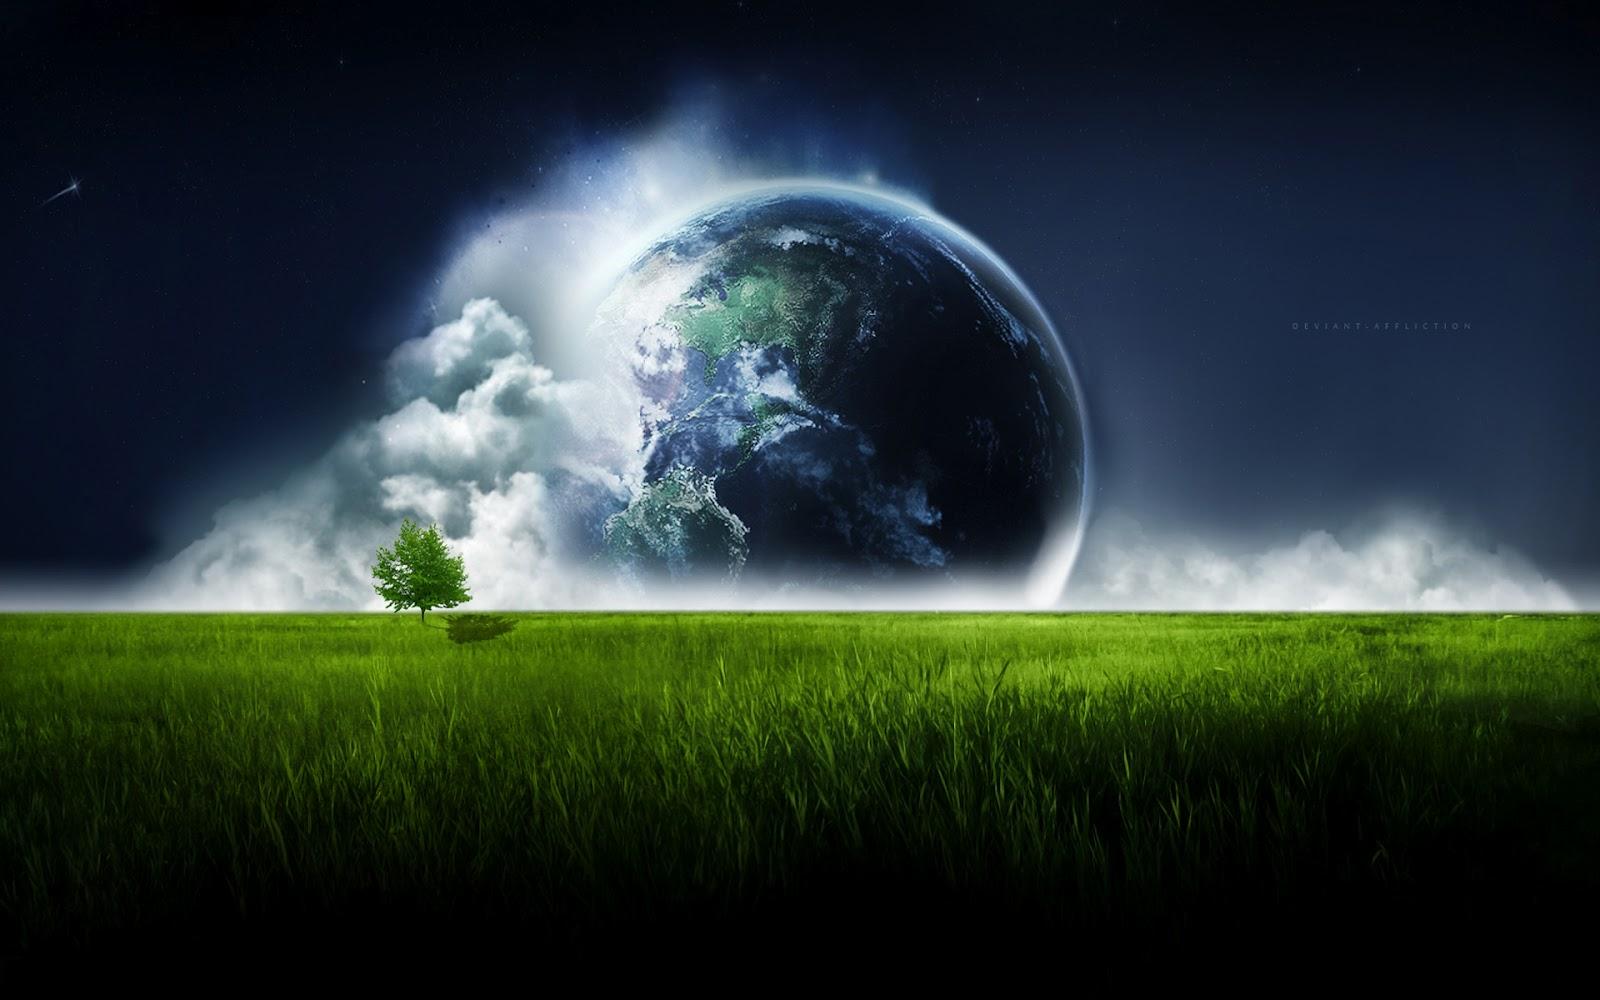 DREAMY WORLD HD WALLPAPER | Global Wallpapers